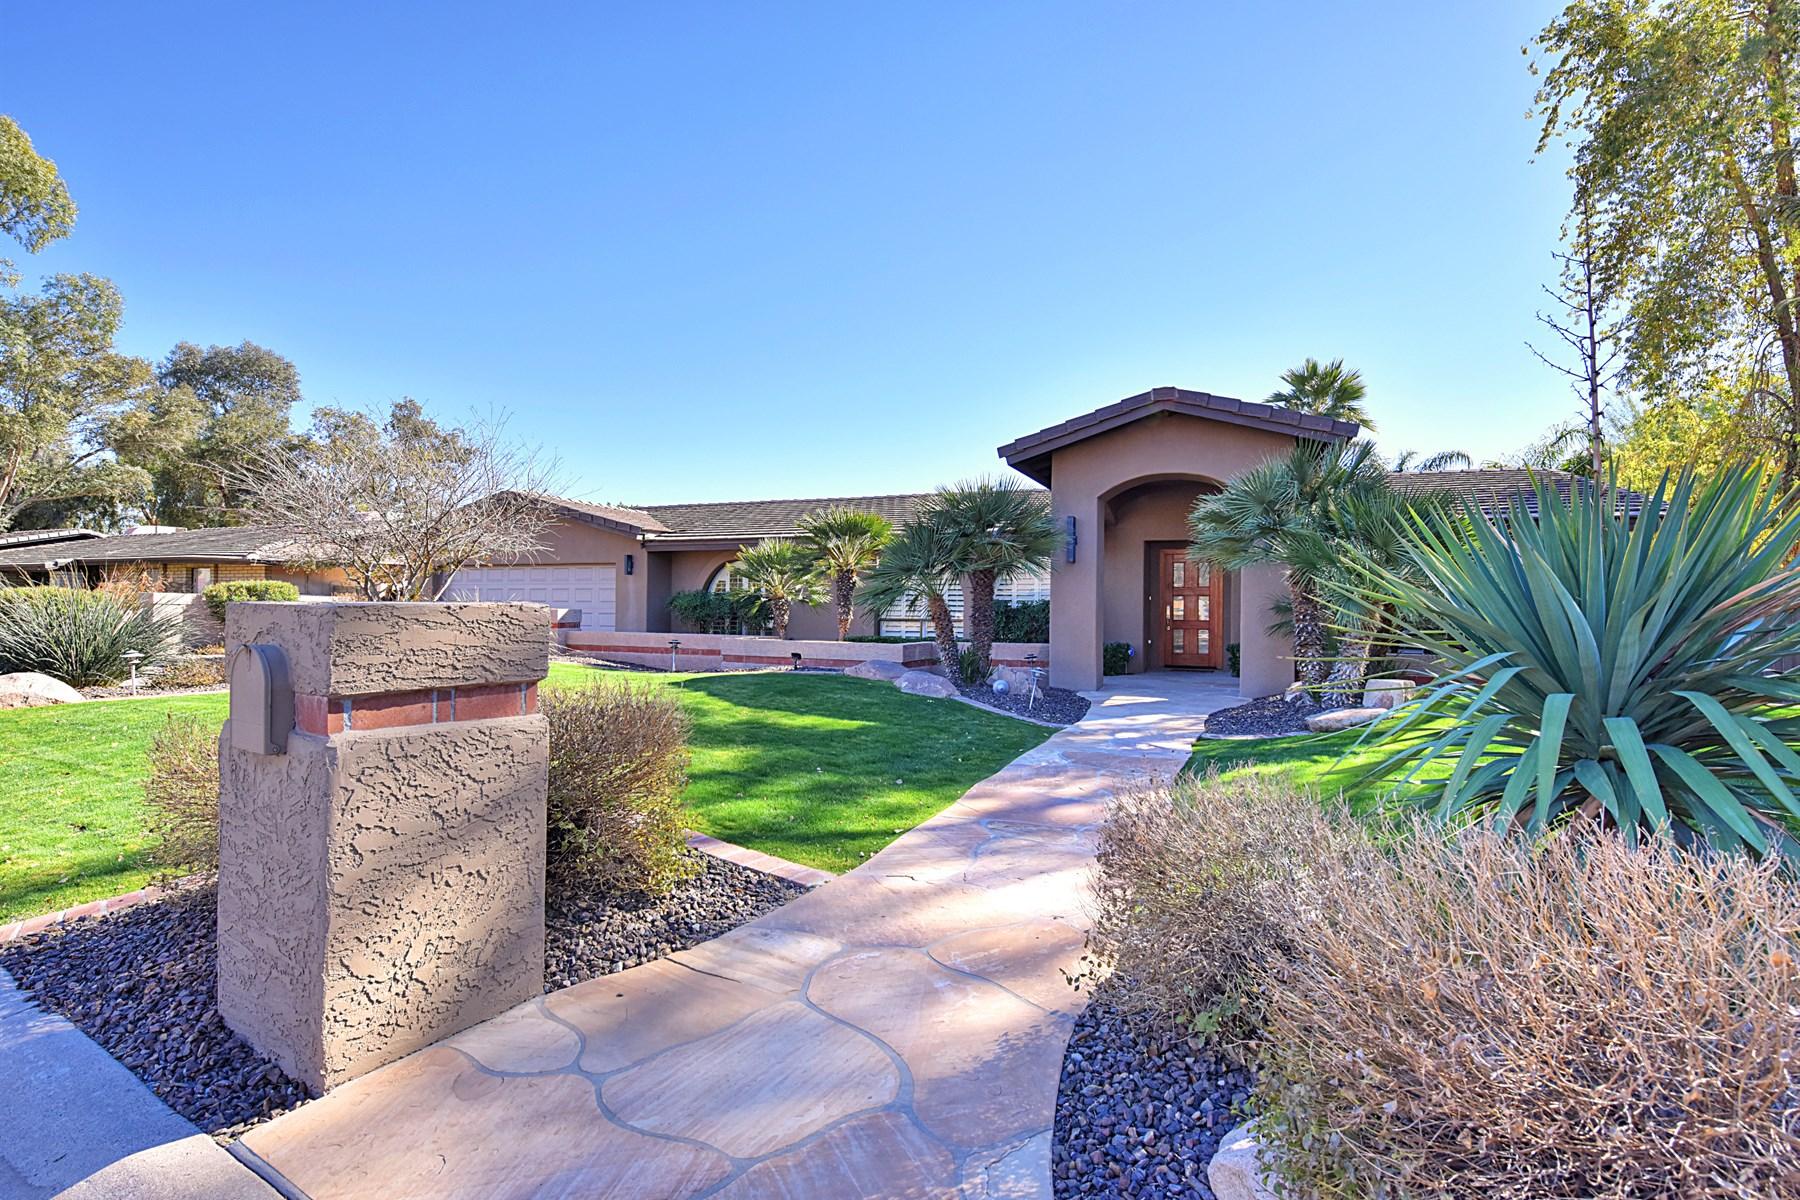 獨棟家庭住宅 為 出售 在 Fabulous six bedroom home 5423 E Crocus Dr Scottsdale, 亞利桑那州, 85254 美國